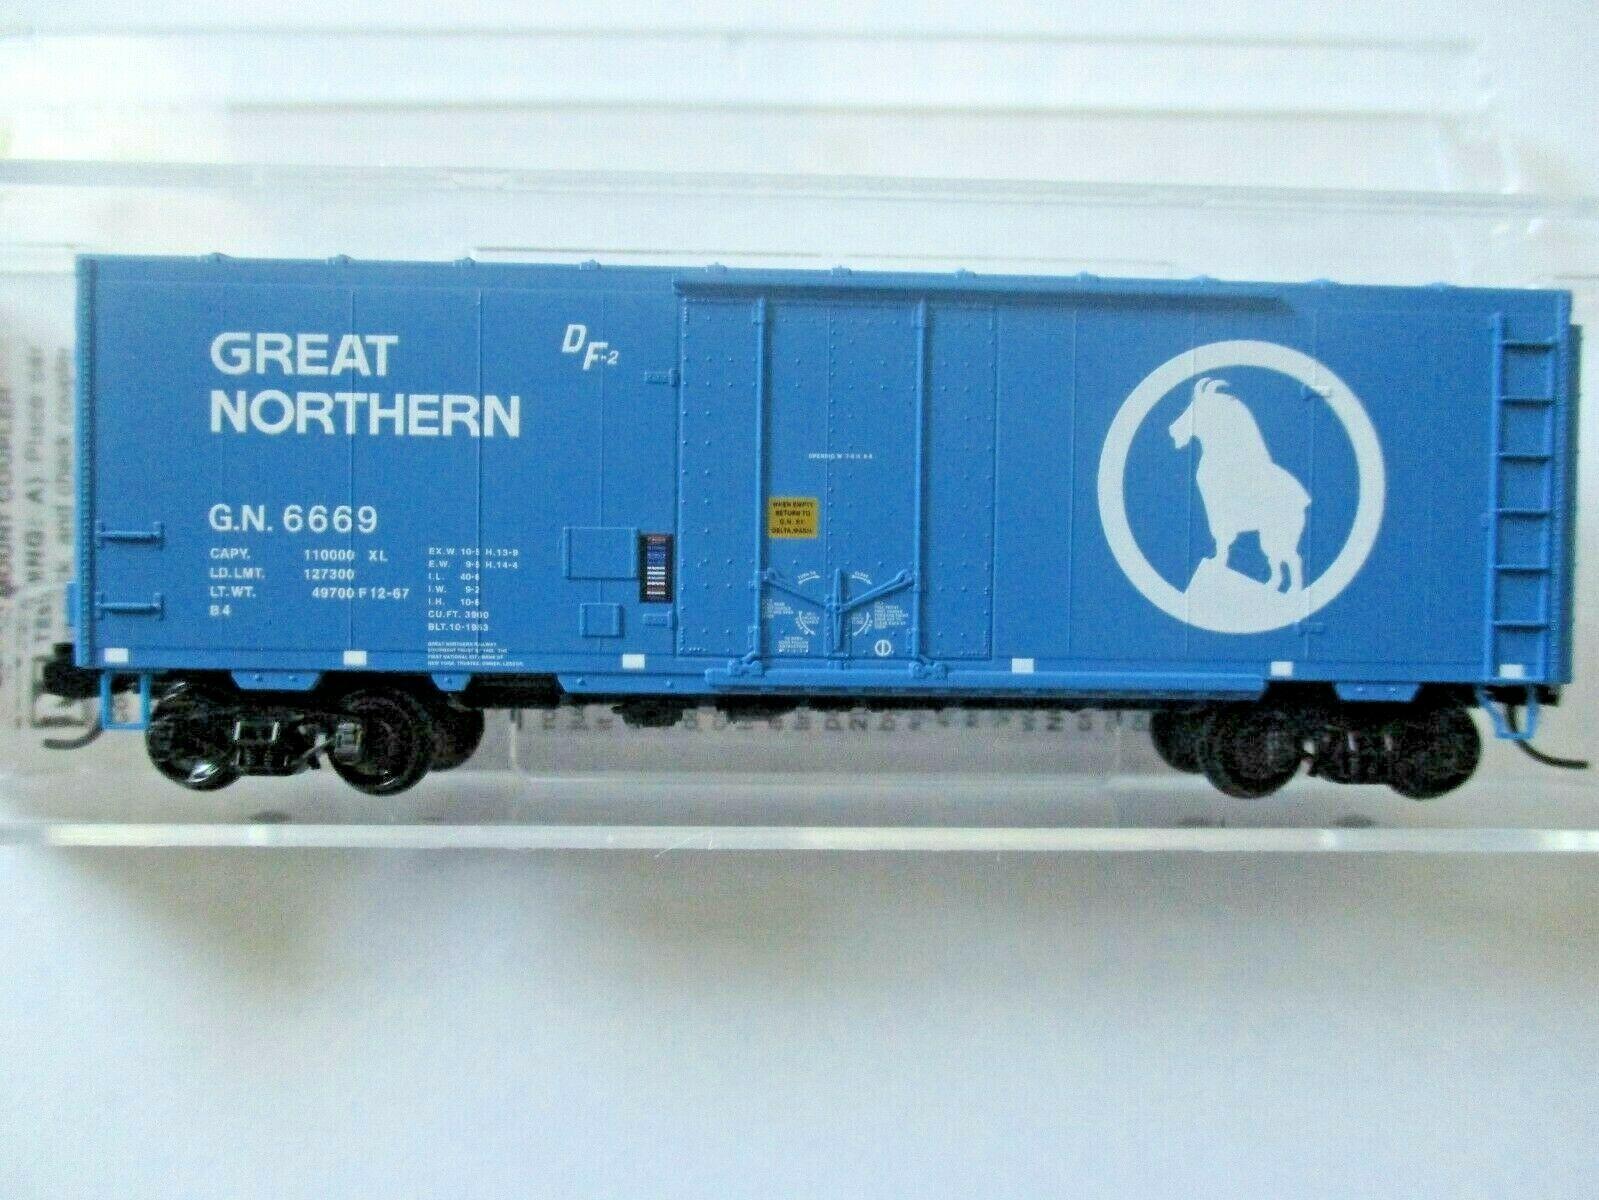 Micro-Trains # 07400037 Great Northern 40' Standard Box Car N-Scale